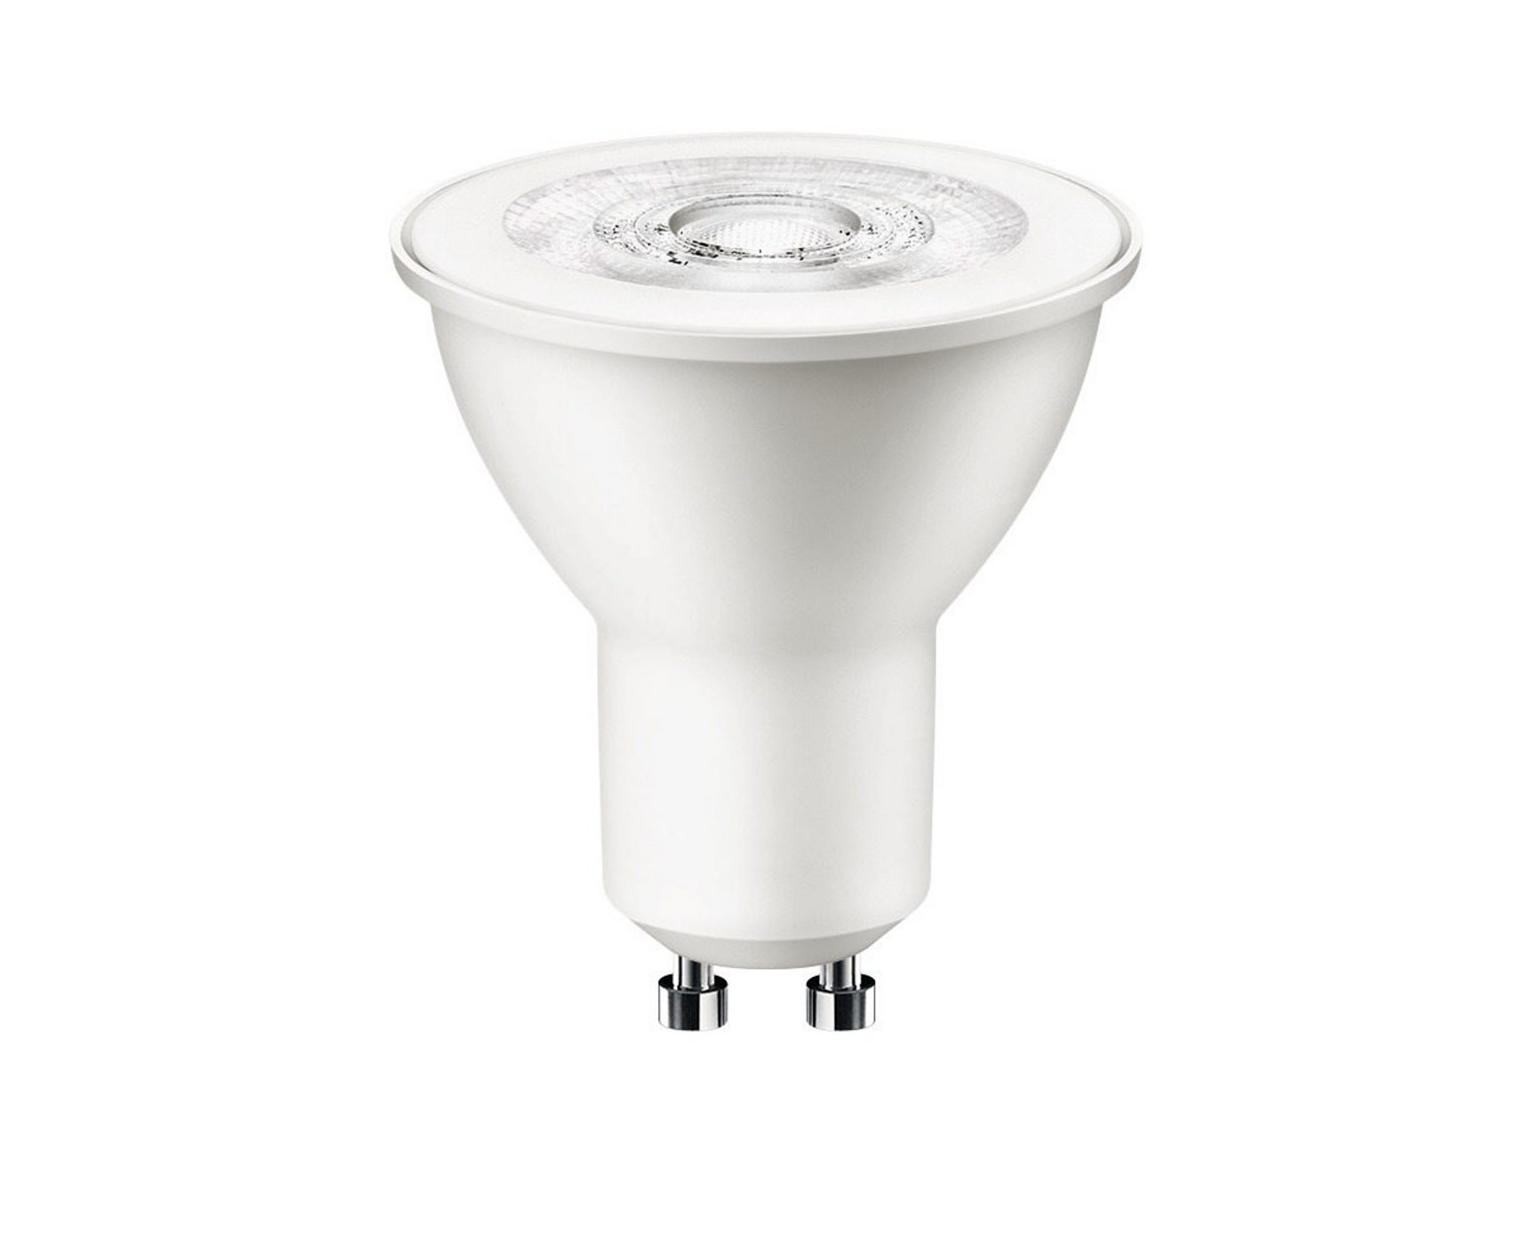 Attralux led leuchtmittel gu reflektor w warmweiß lampe